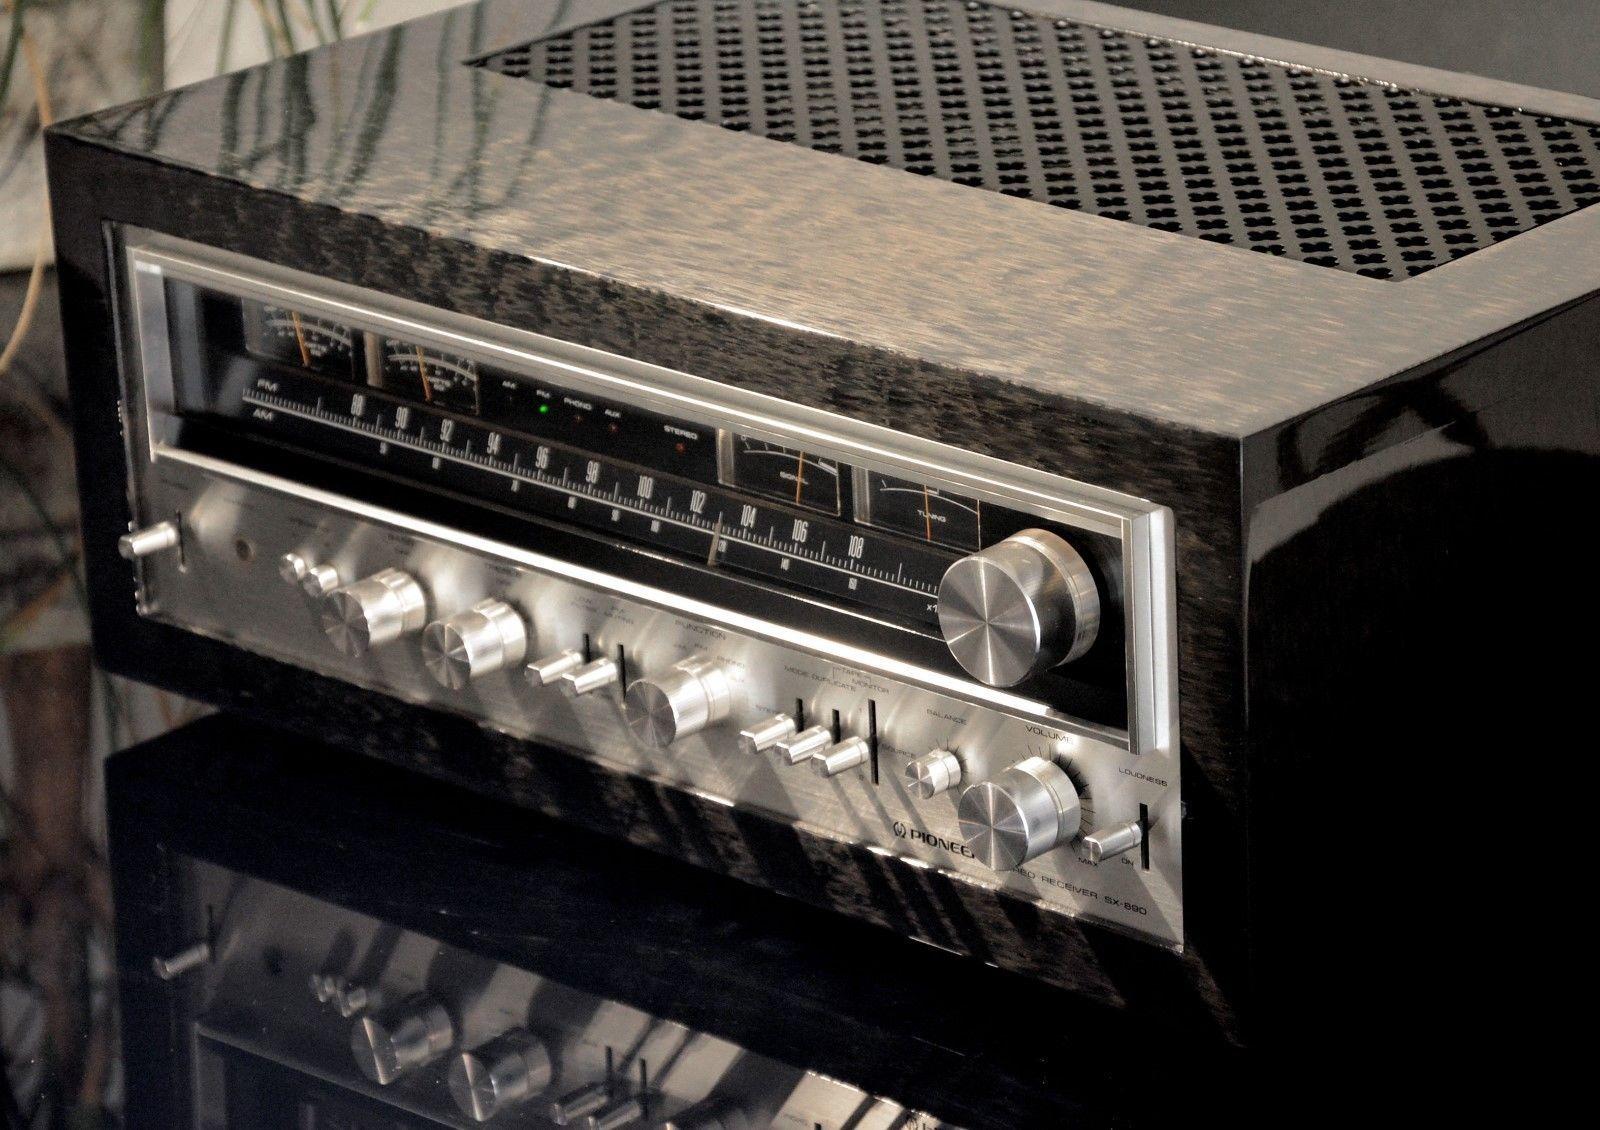 Details about Pioneer SX-890 ec, Vintage Stereo Receiver mit